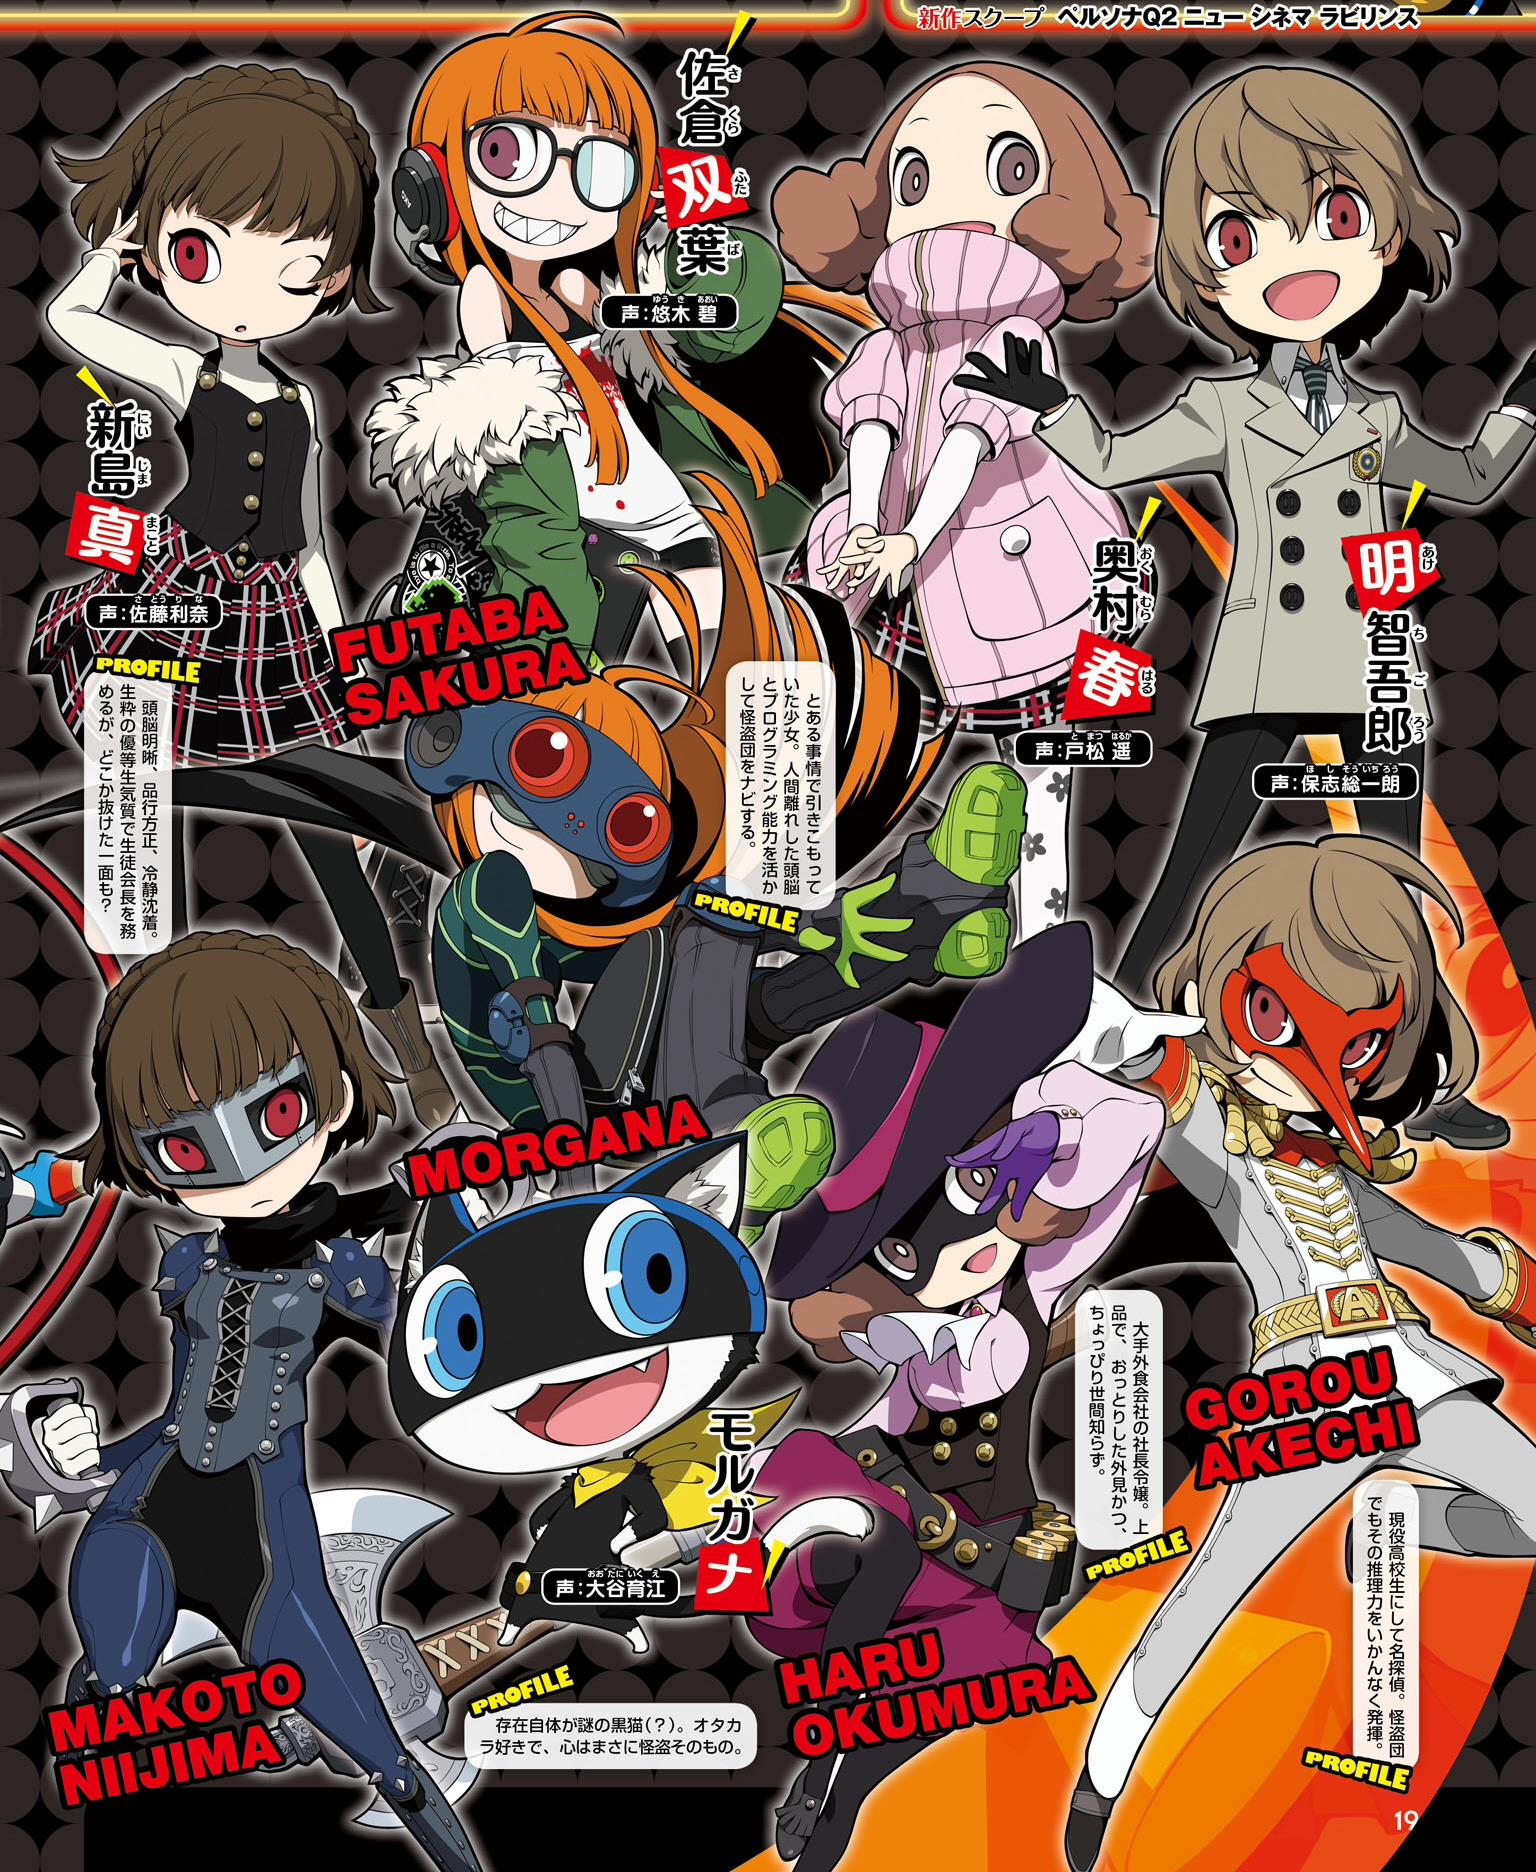 Persona q2 new Cinema Labyrinth walkthrough Jpn Update 1 1